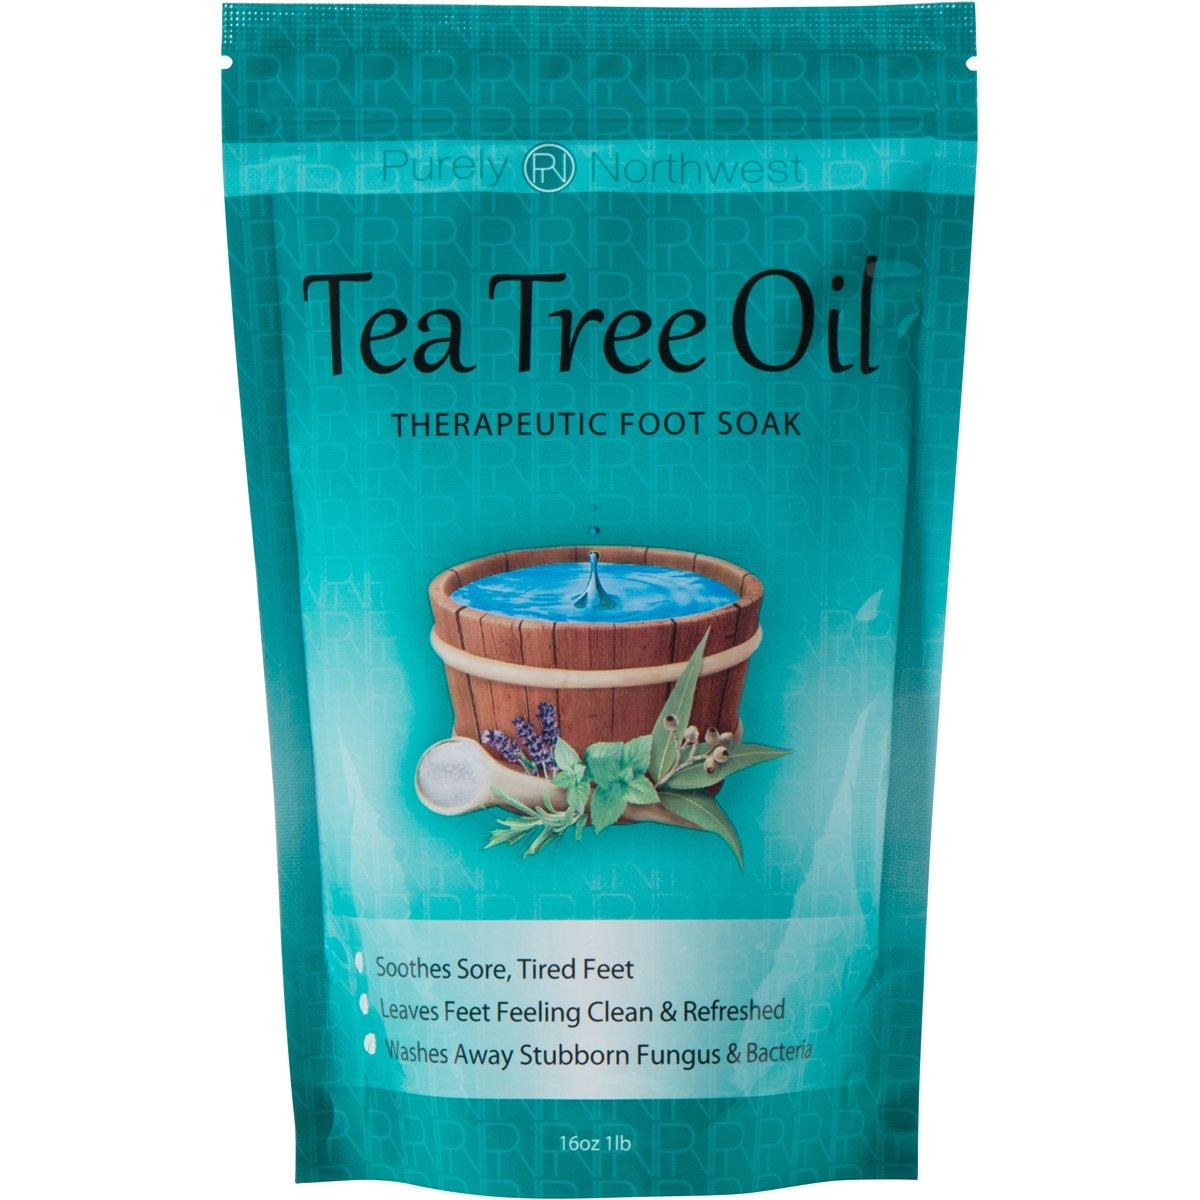 Tea Tree Oil Foot Soak With Epsom Salt, Helps Treat Nail Fungus , Athletes Foot & Stubborn Foot Odor 16oz by Purely Northwest